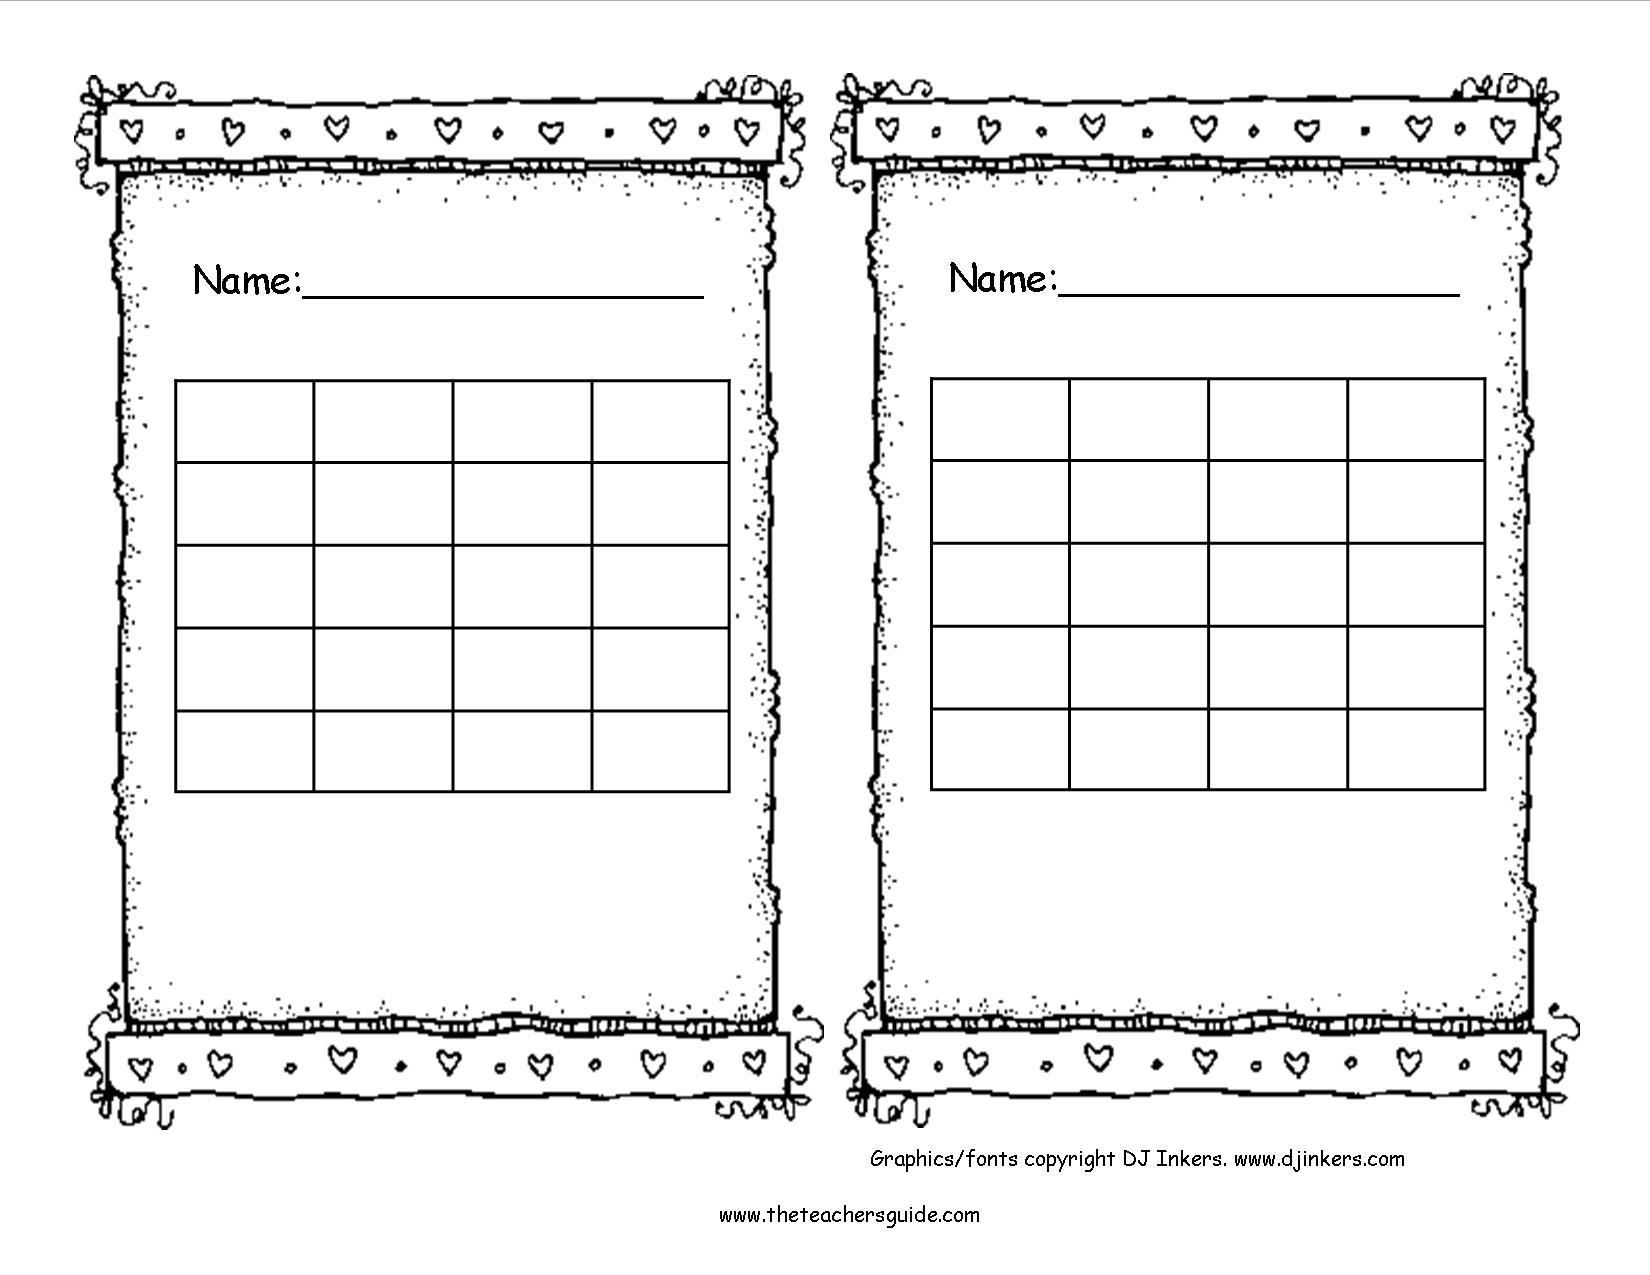 Free Printable Reward And Incentive Charts inside Blank Free Printable Star Charts Monday Thru Friday